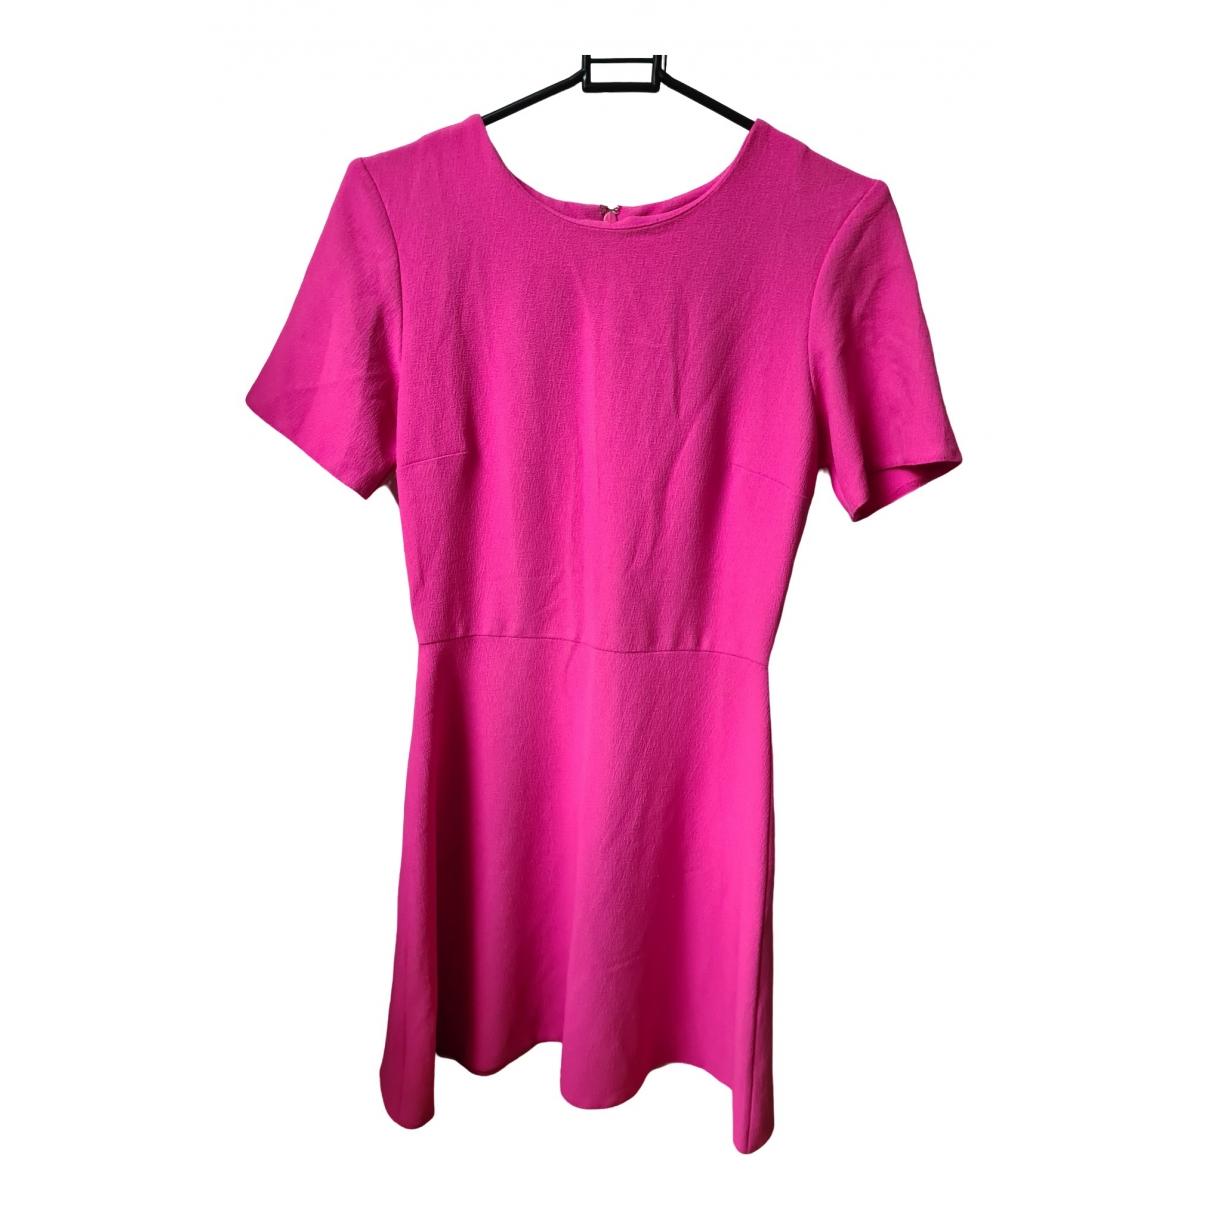 Miss Selfridge \N Pink dress for Women 8 UK